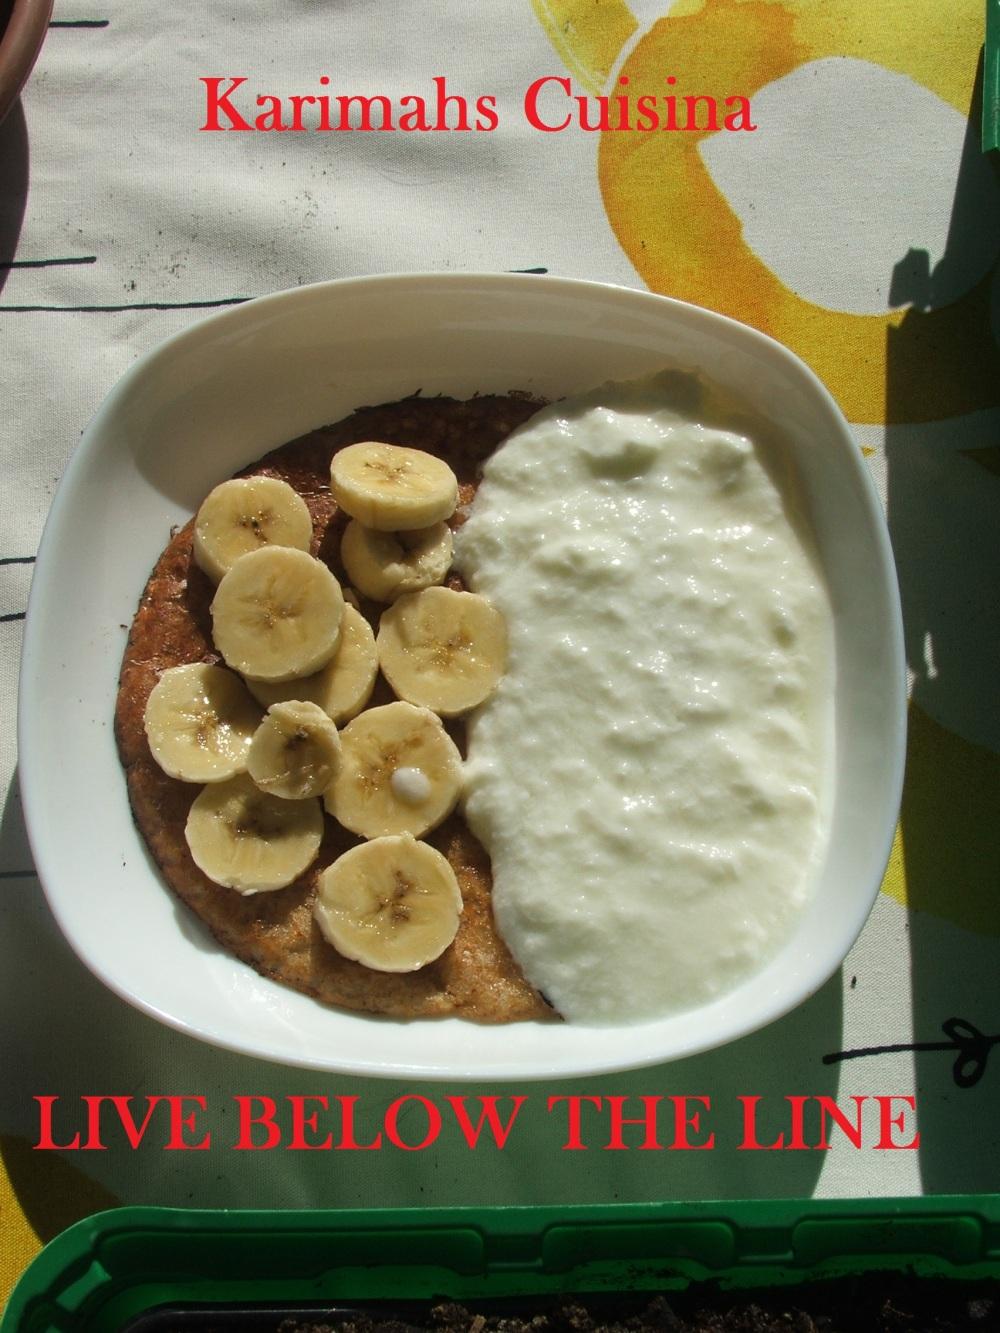 One Pancake, Half A Banana &Yoghurt